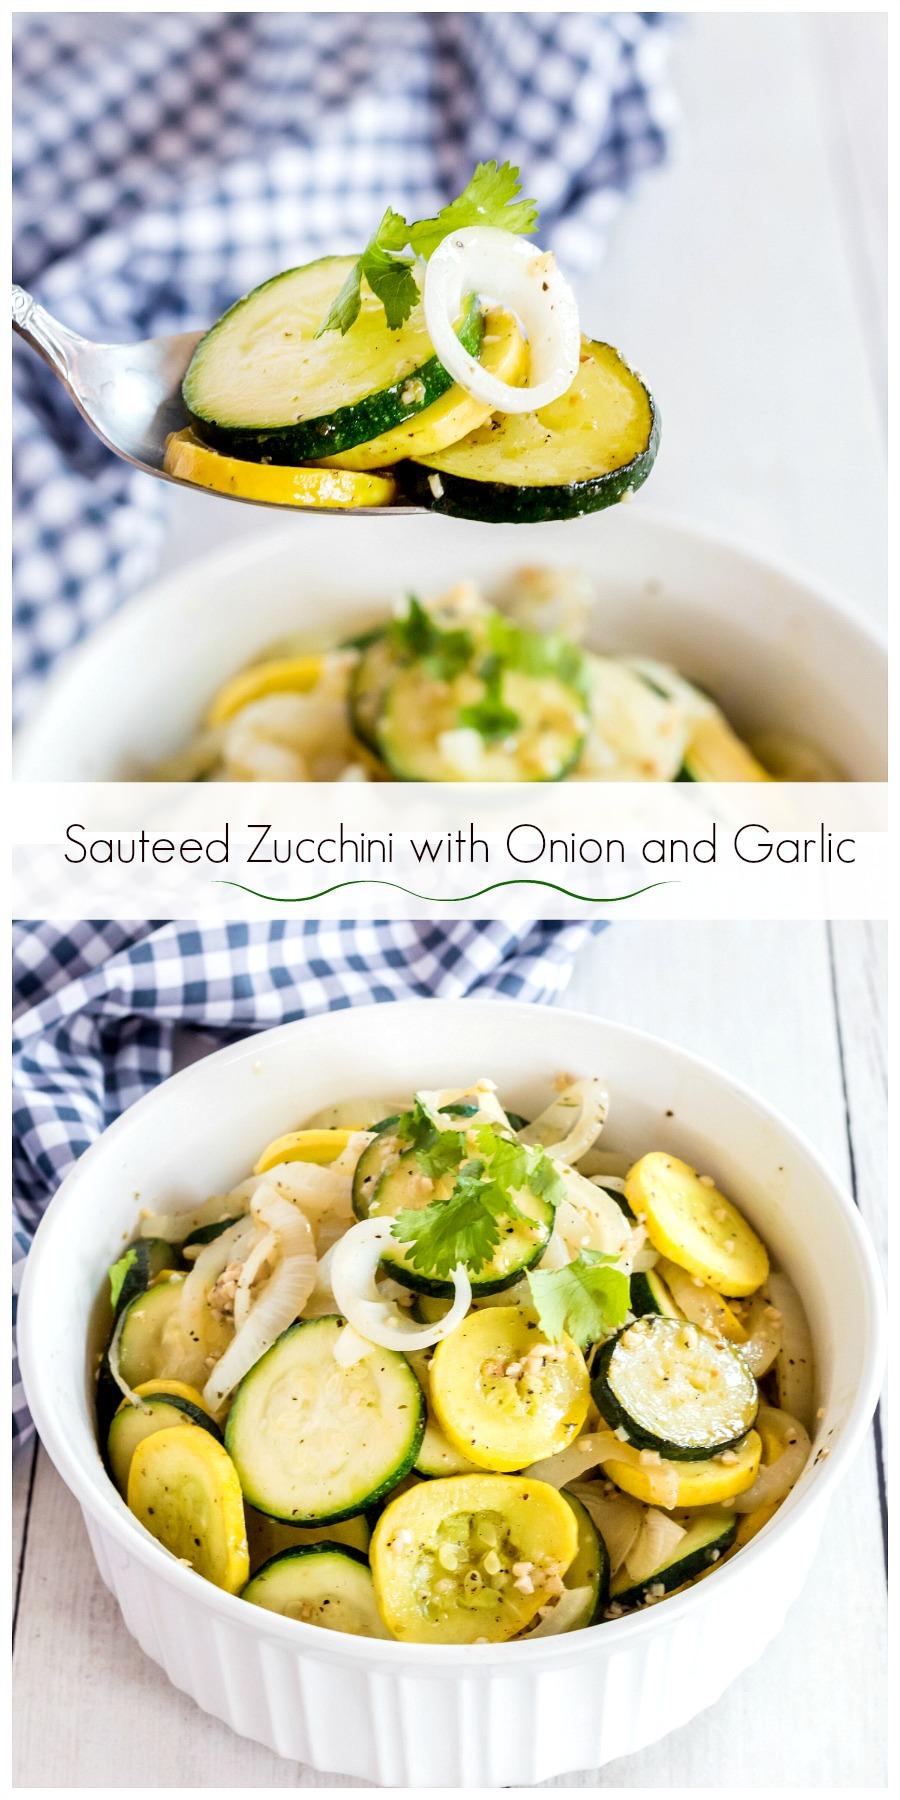 Zucchini with Onion and Garlic